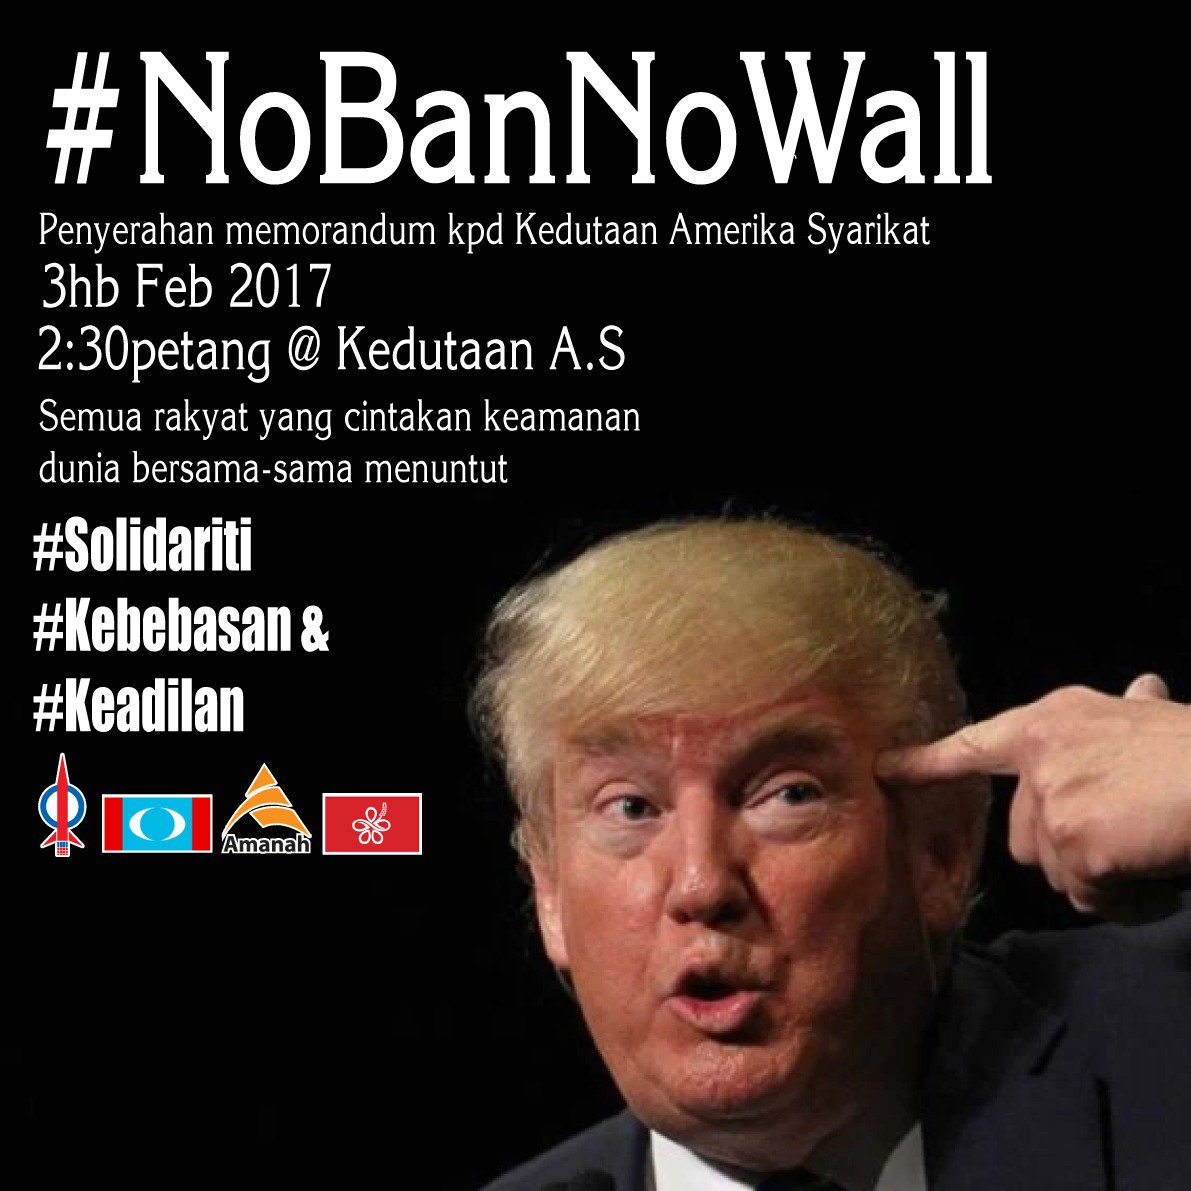 Malaysian anti-Trump poster